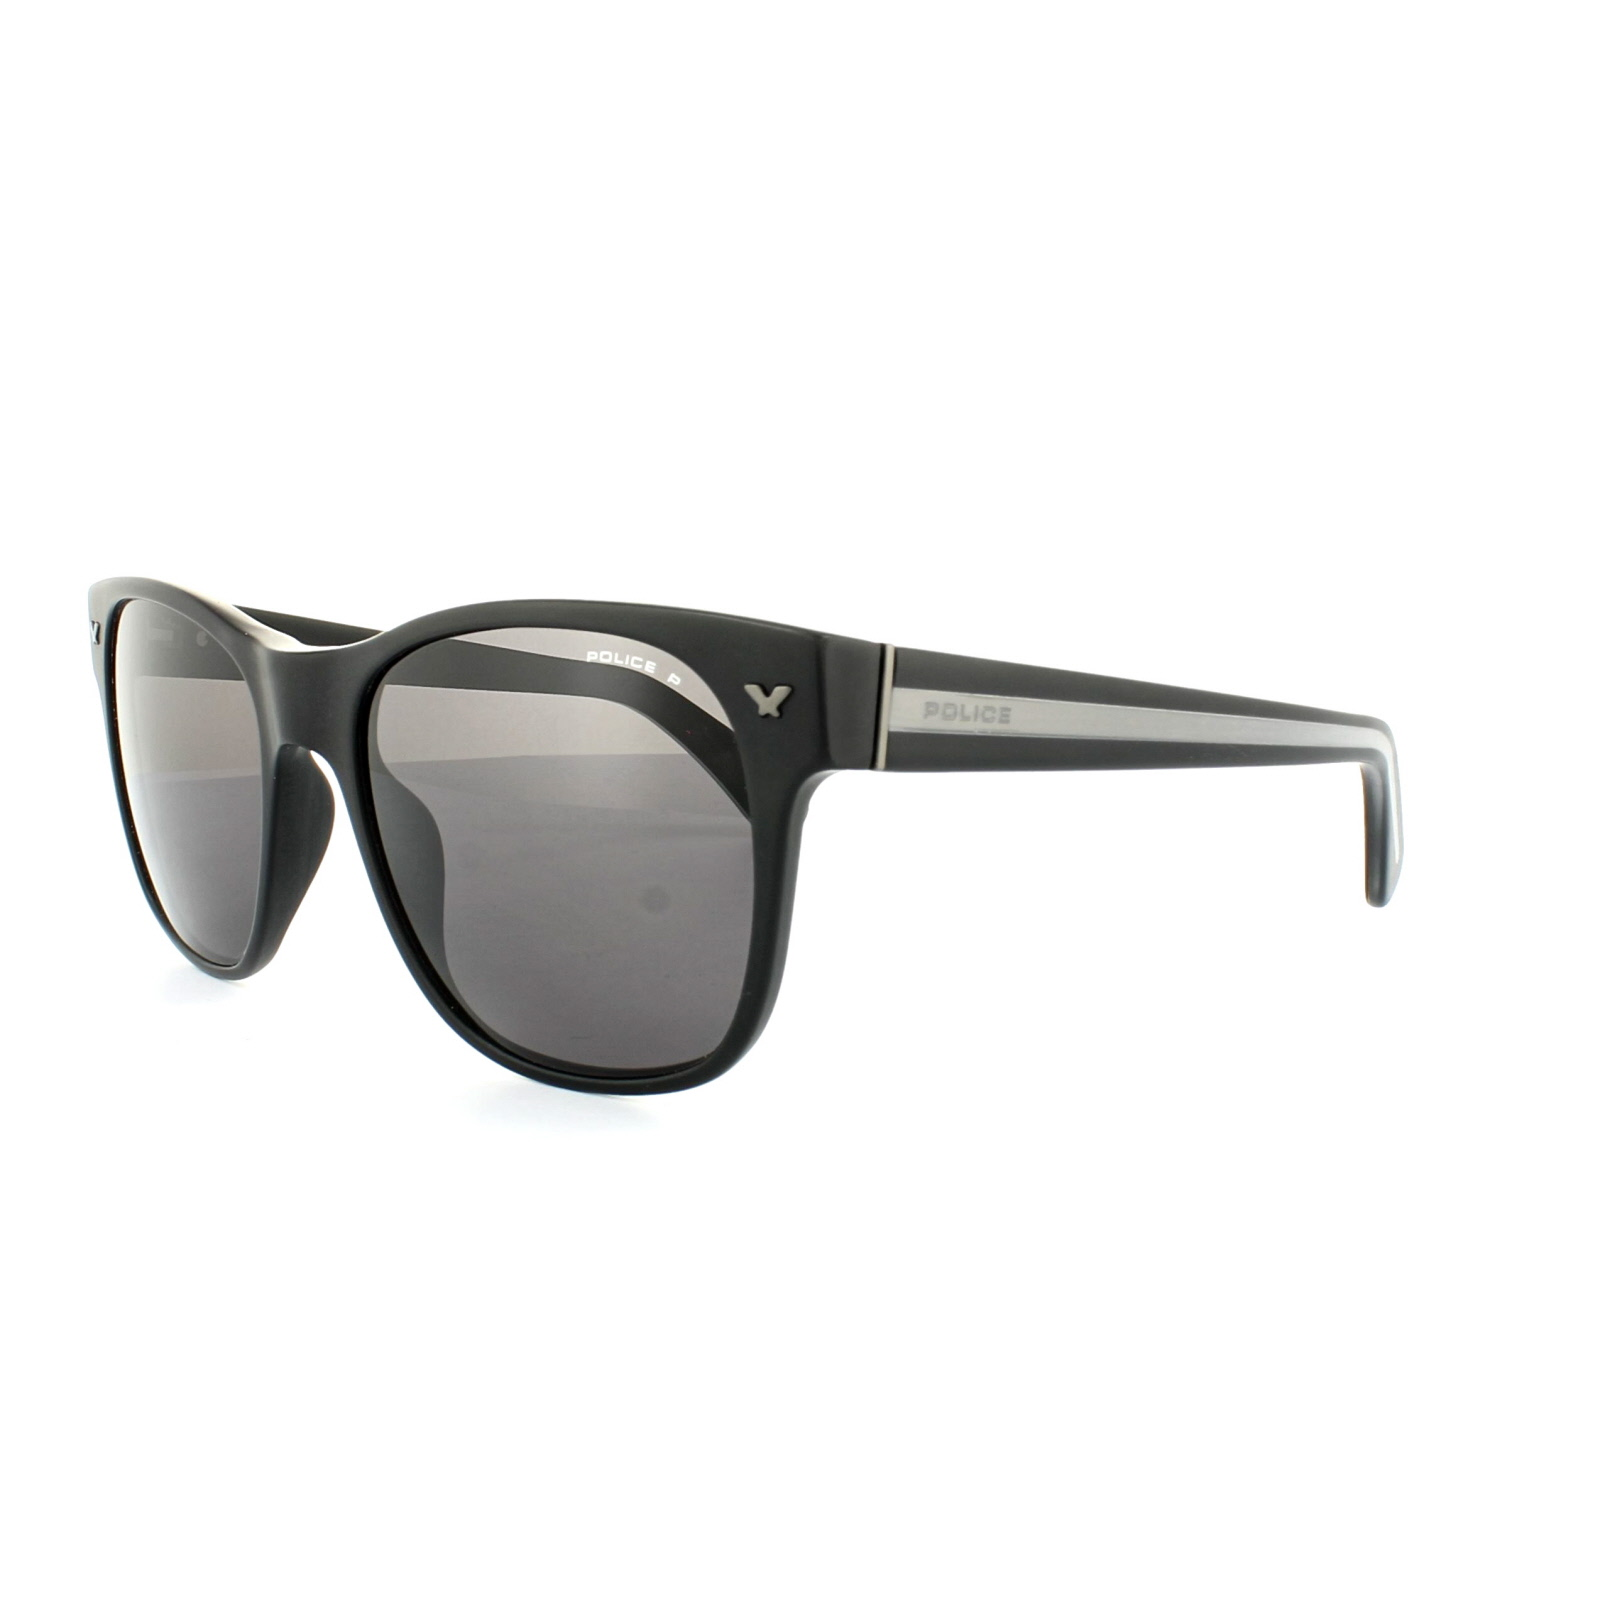 b296850b3fc23 Police Sunglasses SPL164 703P Matt Black Grey Polarized 883663838780 ...